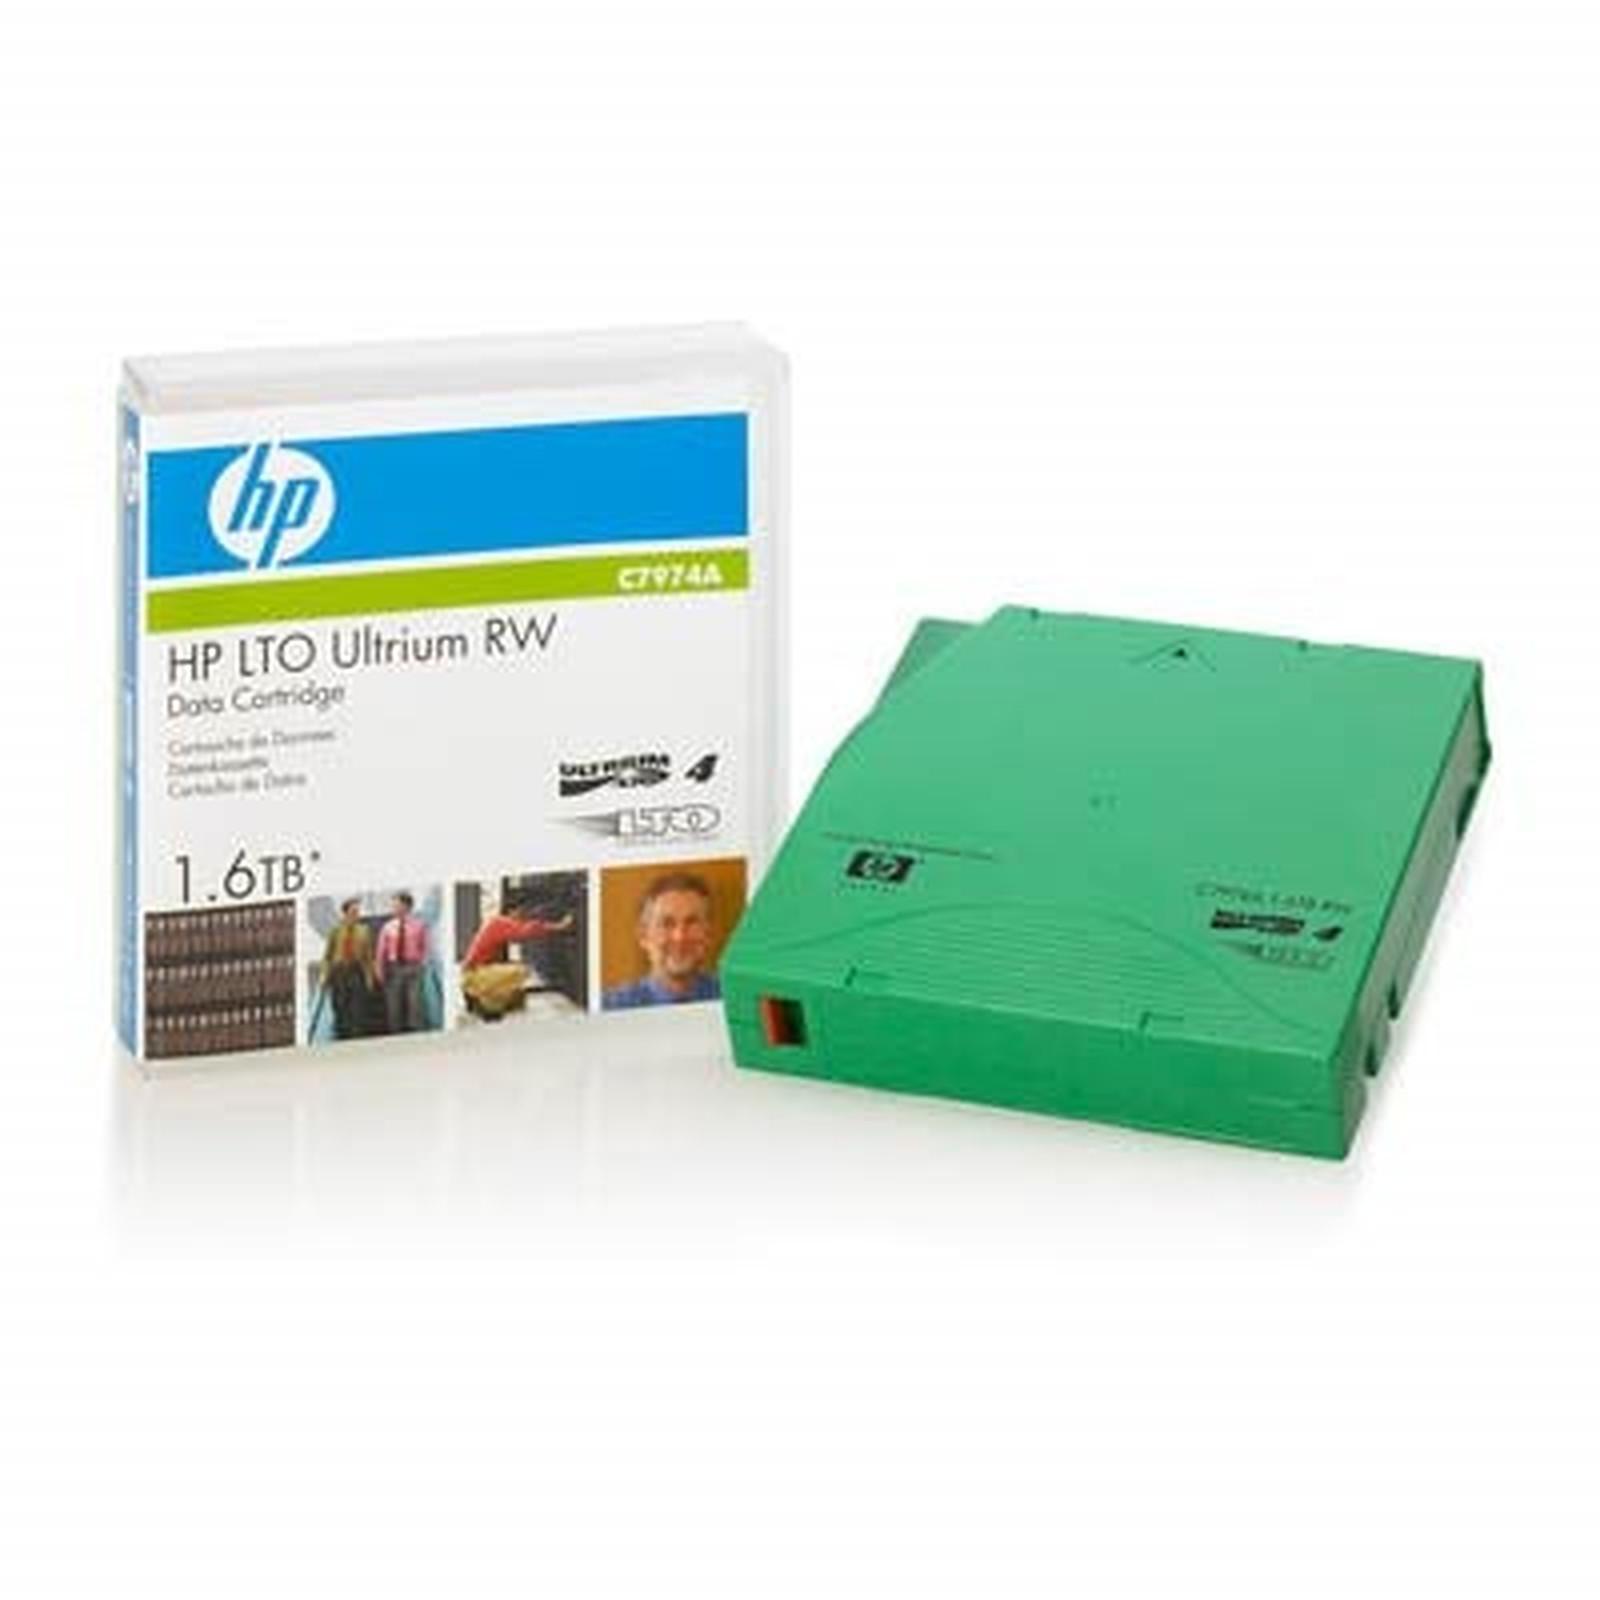 HP C7974A Ultrium 1.6 To RW